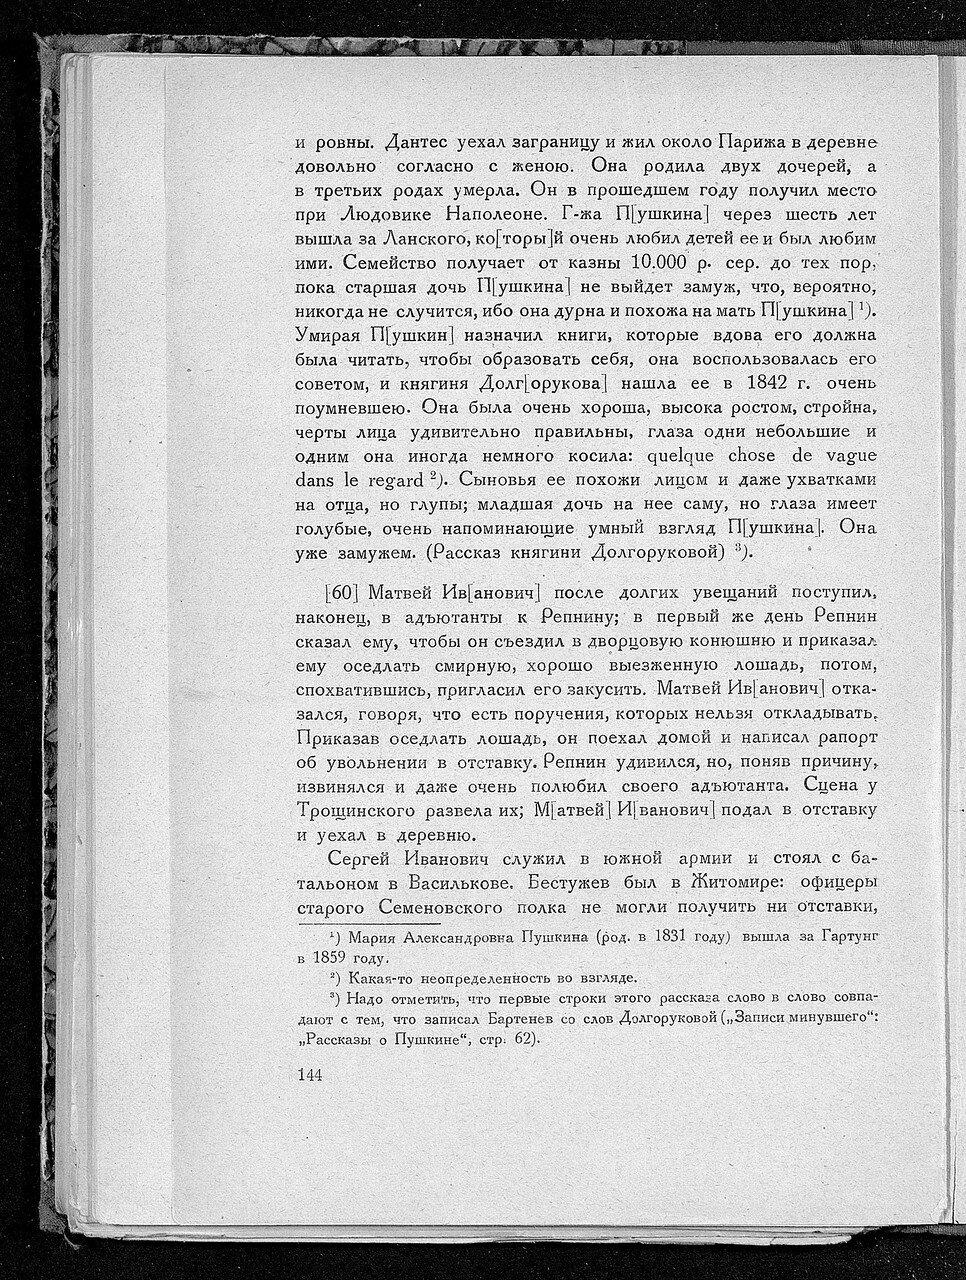 https://img-fotki.yandex.ru/get/9823/199368979.a2/0_21438b_75b5d124_XXXL.jpg